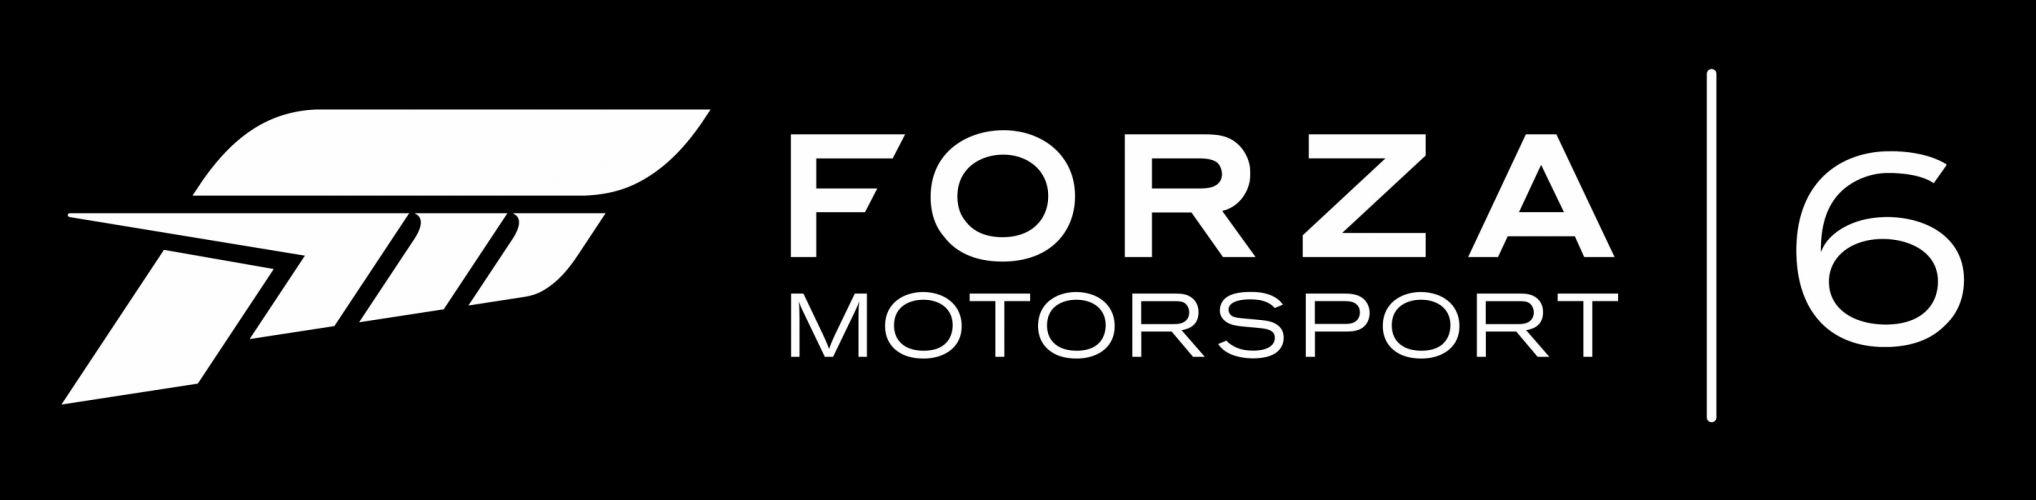 FORZA MOTORSPORT 6 race racing supercar formula xbox action six poster wallpaper